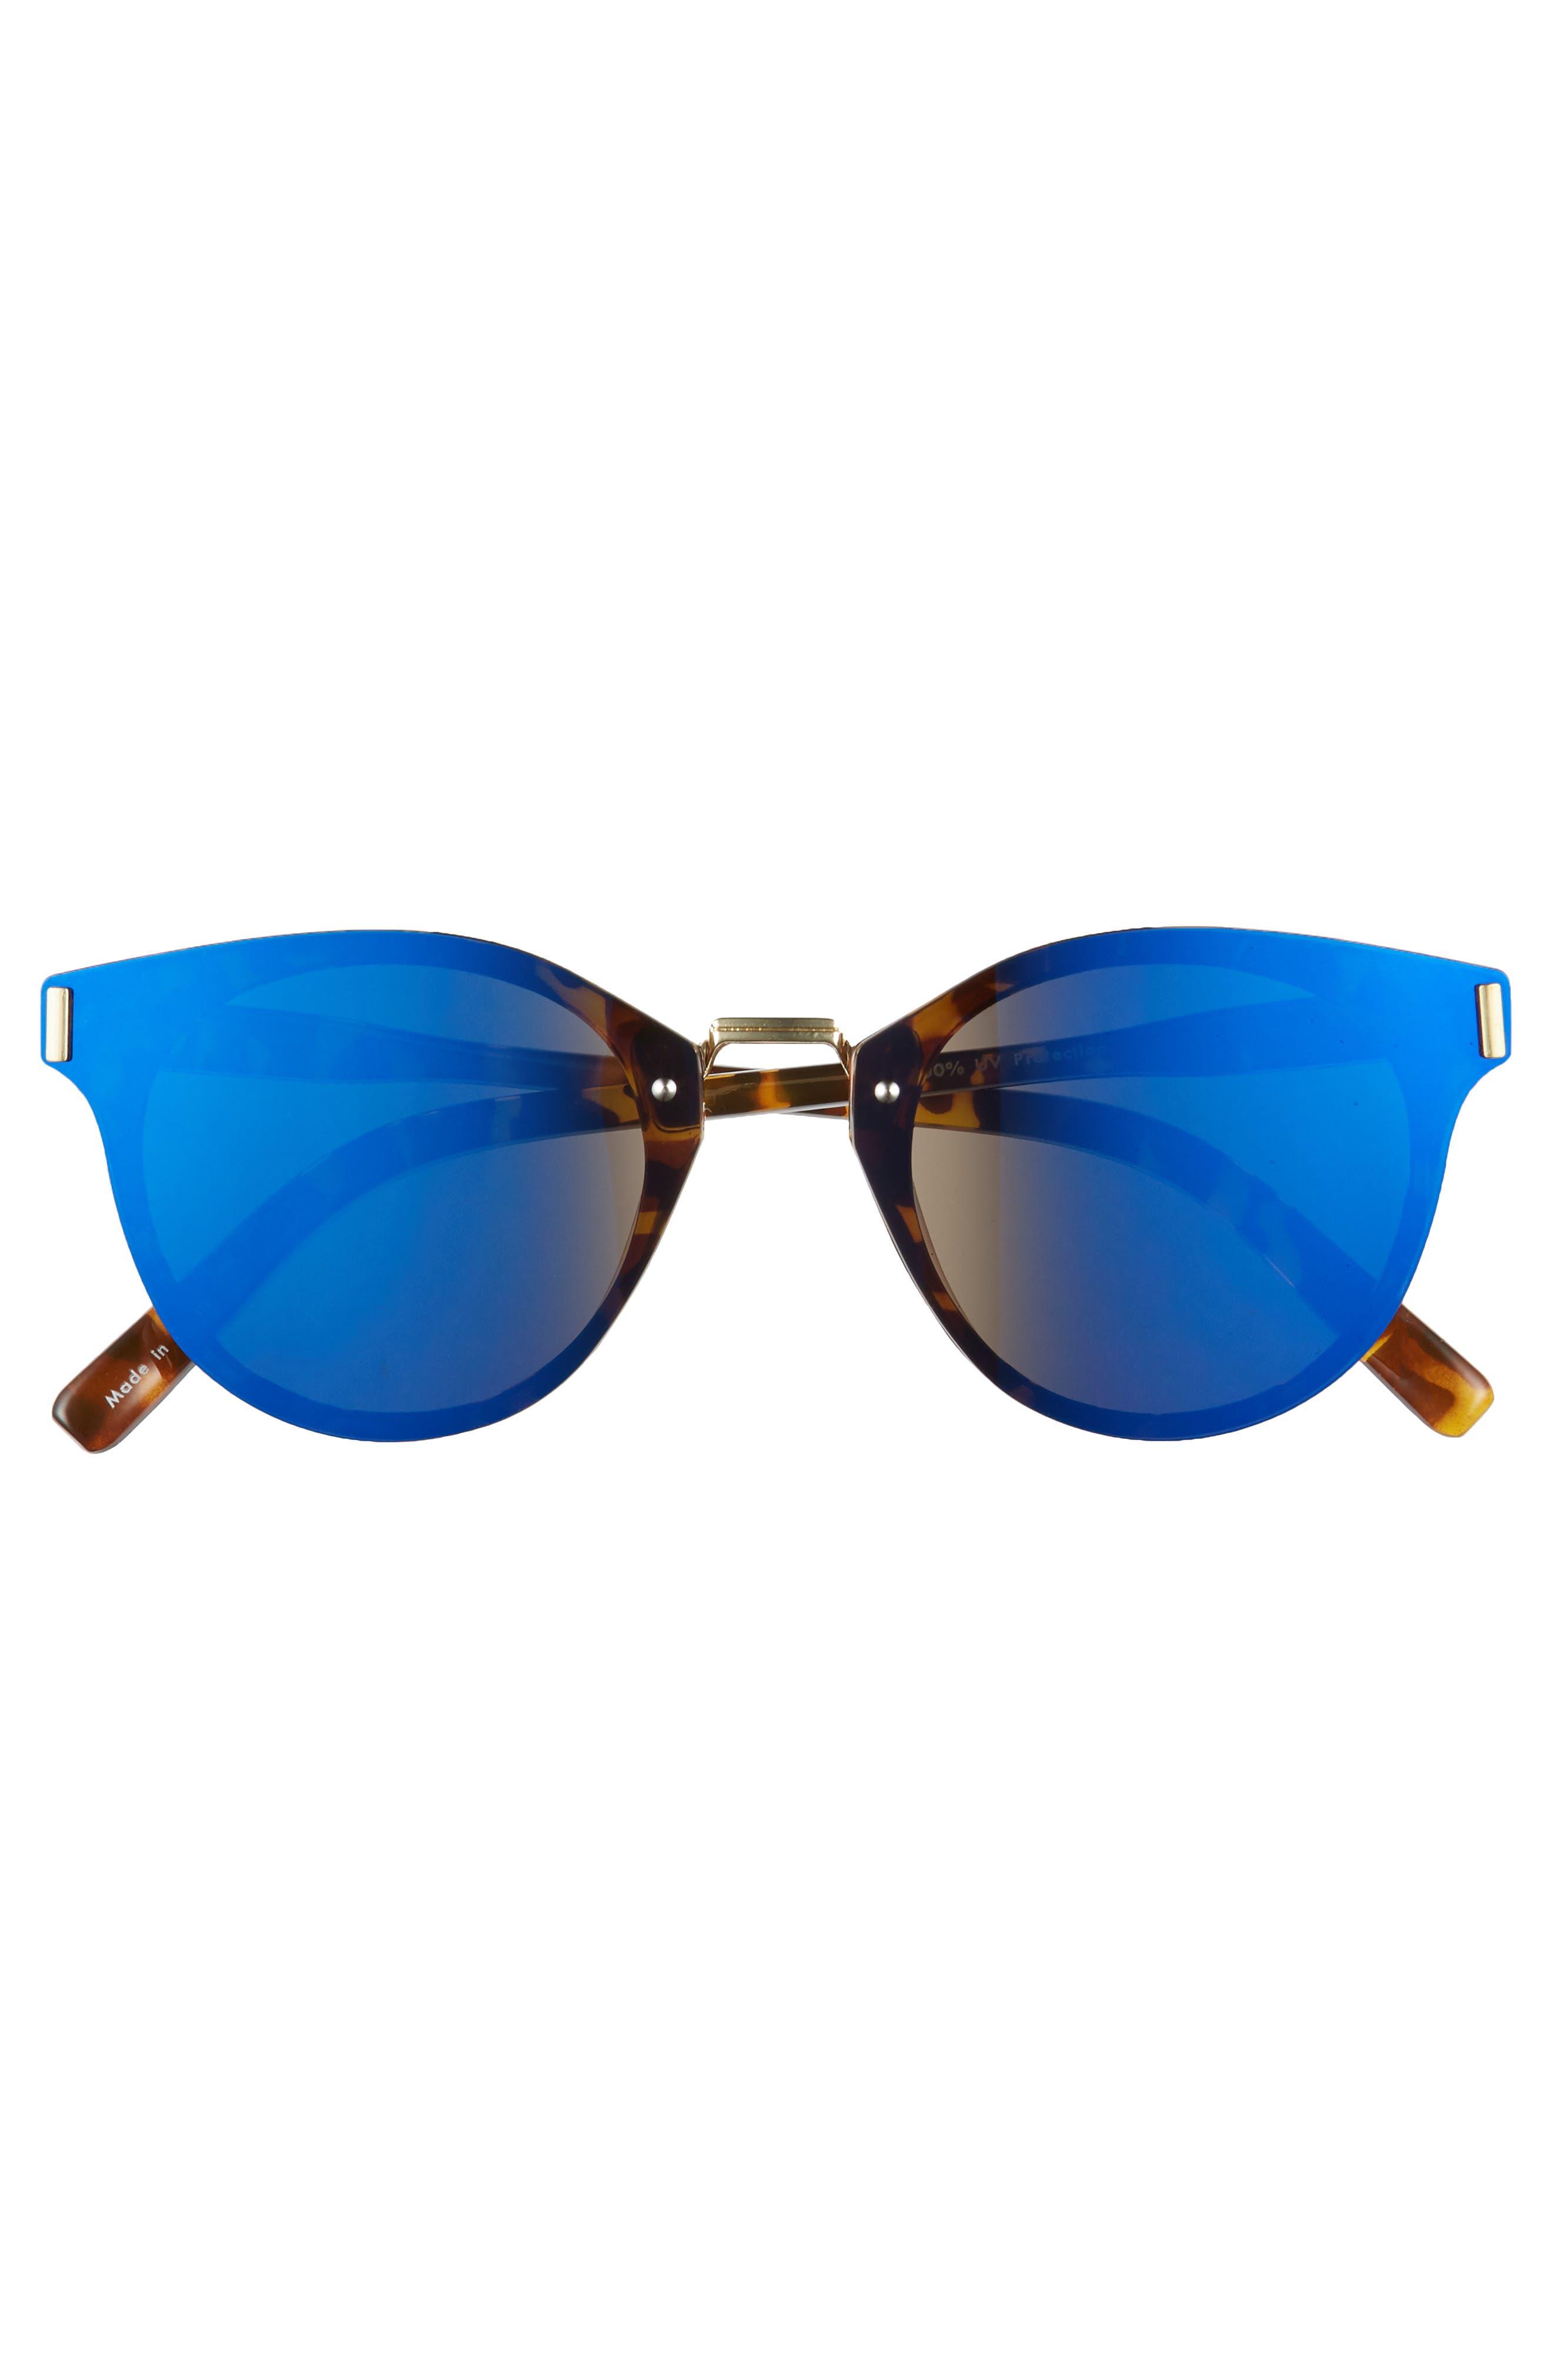 Flat Cat Eye Sunglasses,                             Alternate thumbnail 3, color,                             Tort/ Blue